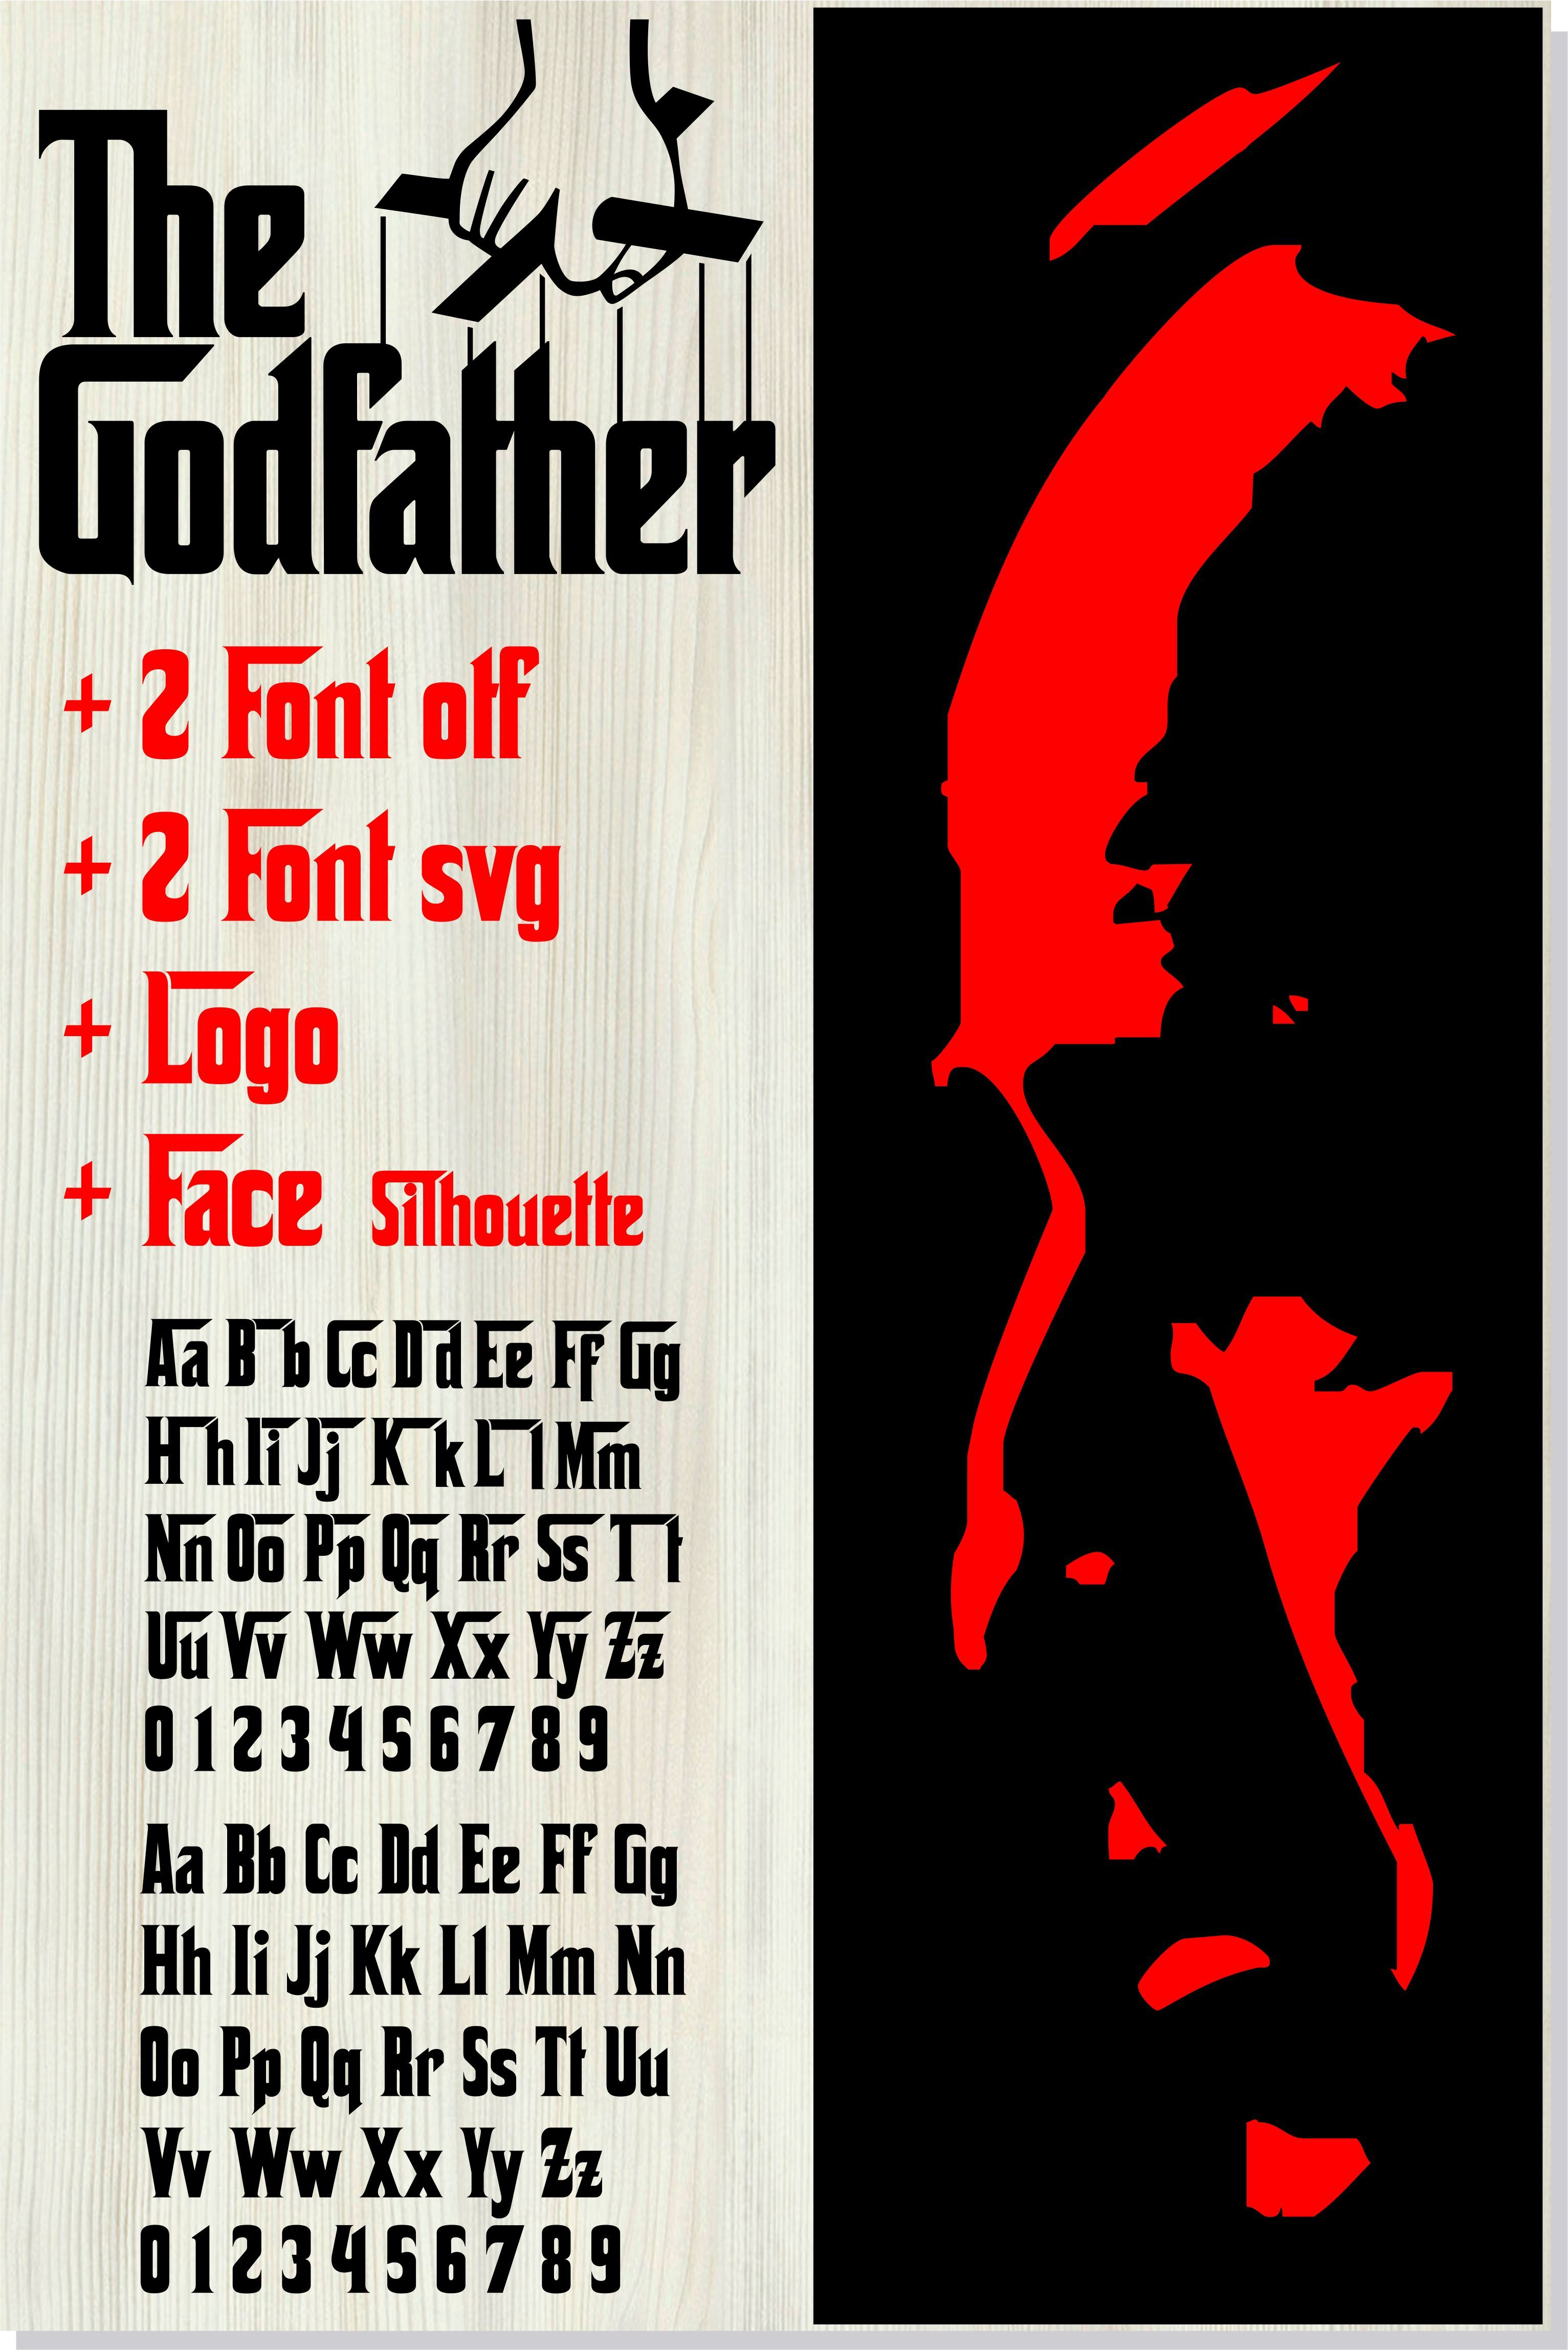 Godfather Bundle Godfather Font Svg Godfather Font Otf Godfather Logo Godfather Face Silhouette Svg Otf Png Eps Dxf The Godfather Silhouette Svg Logo Face